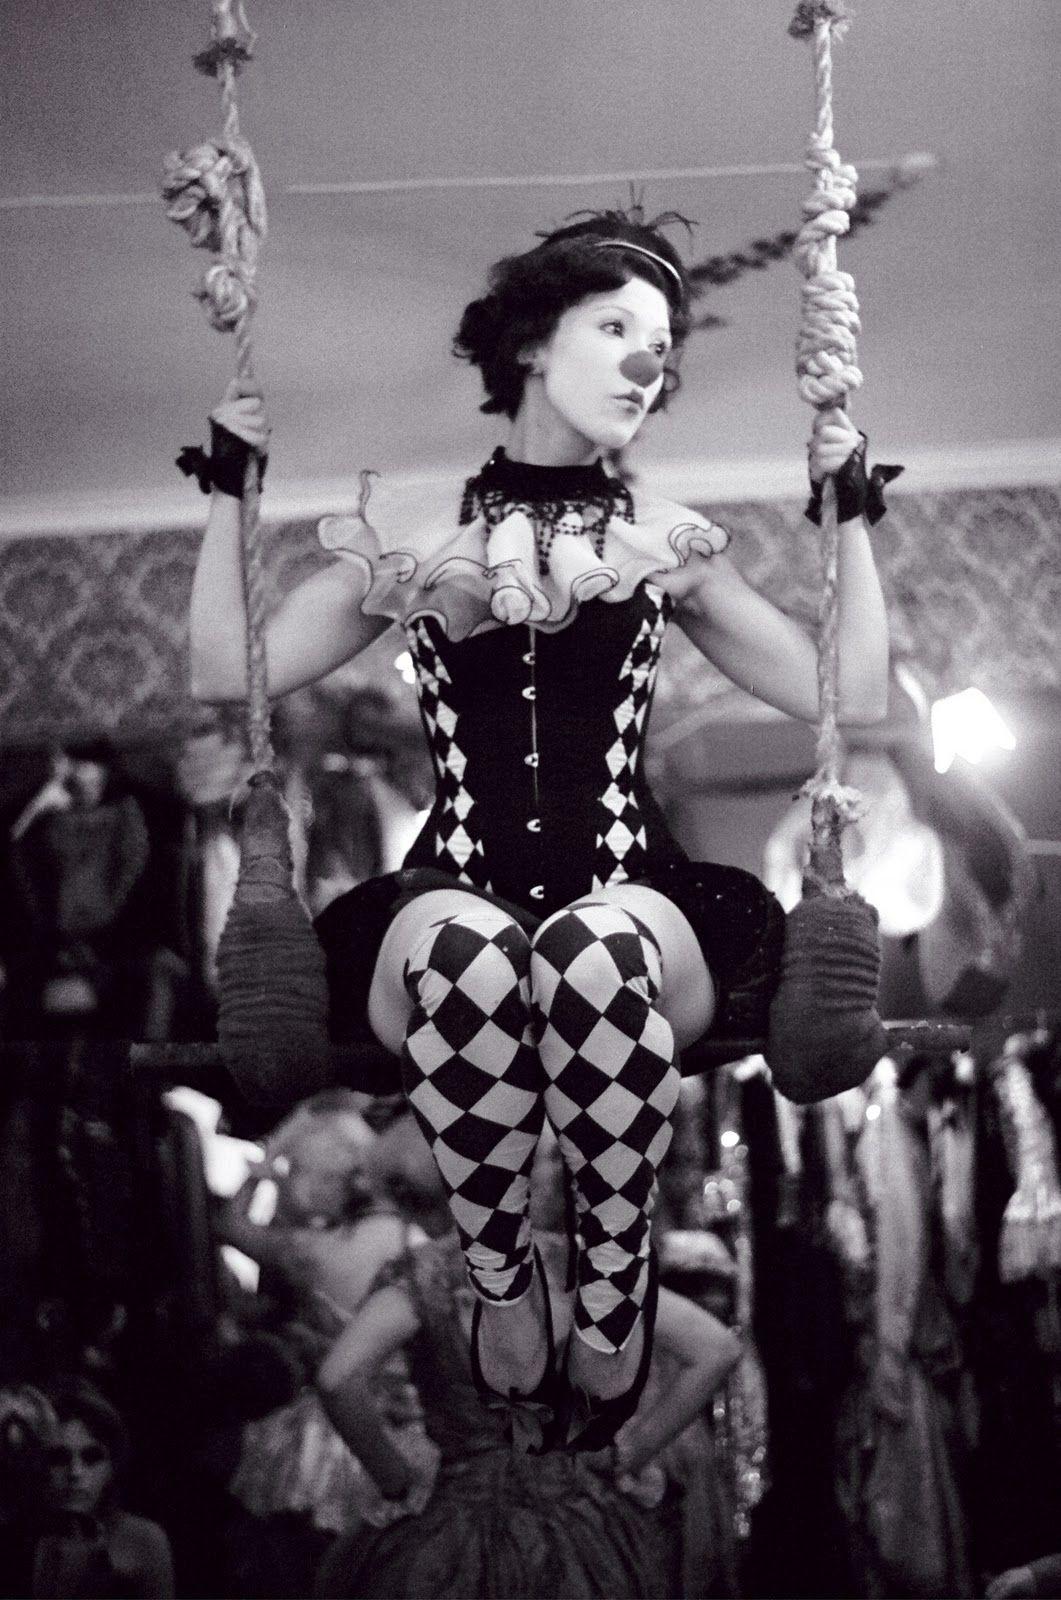 Pin By Dawn Renee On Night Circus Vintage Circus Circus Fashion Circus Costume